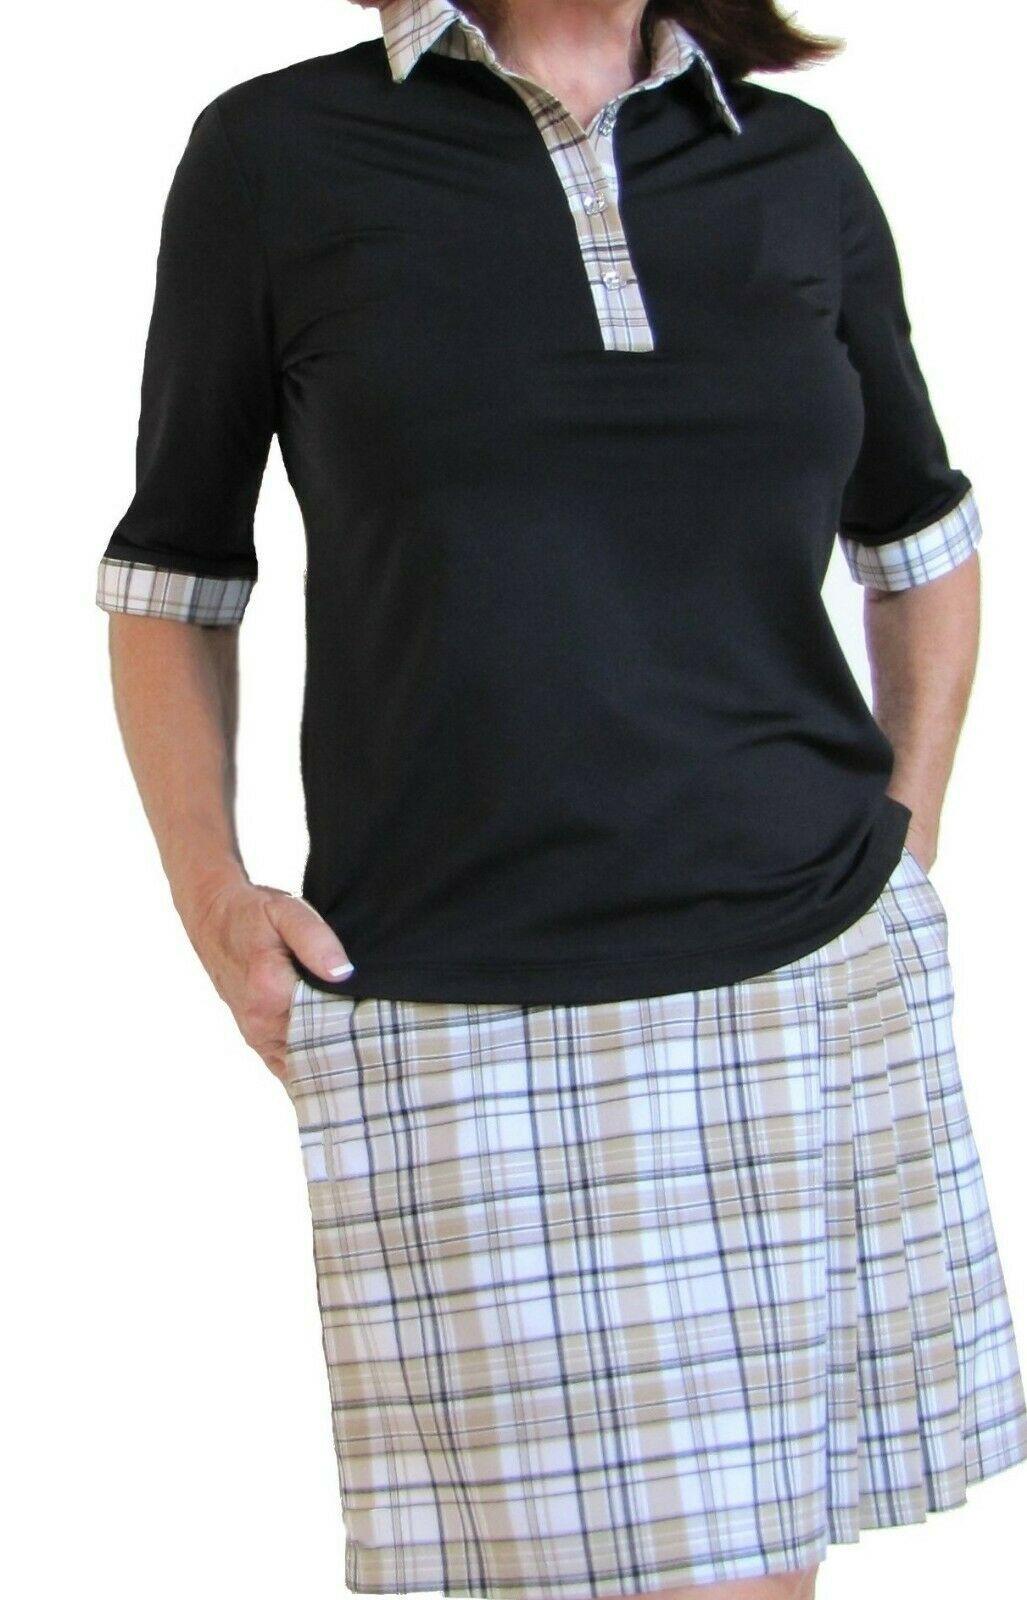 Stylish Women's Golf & Casual Tan Short Sleeve Mock Polo, Rhinestone Zipper  image 3